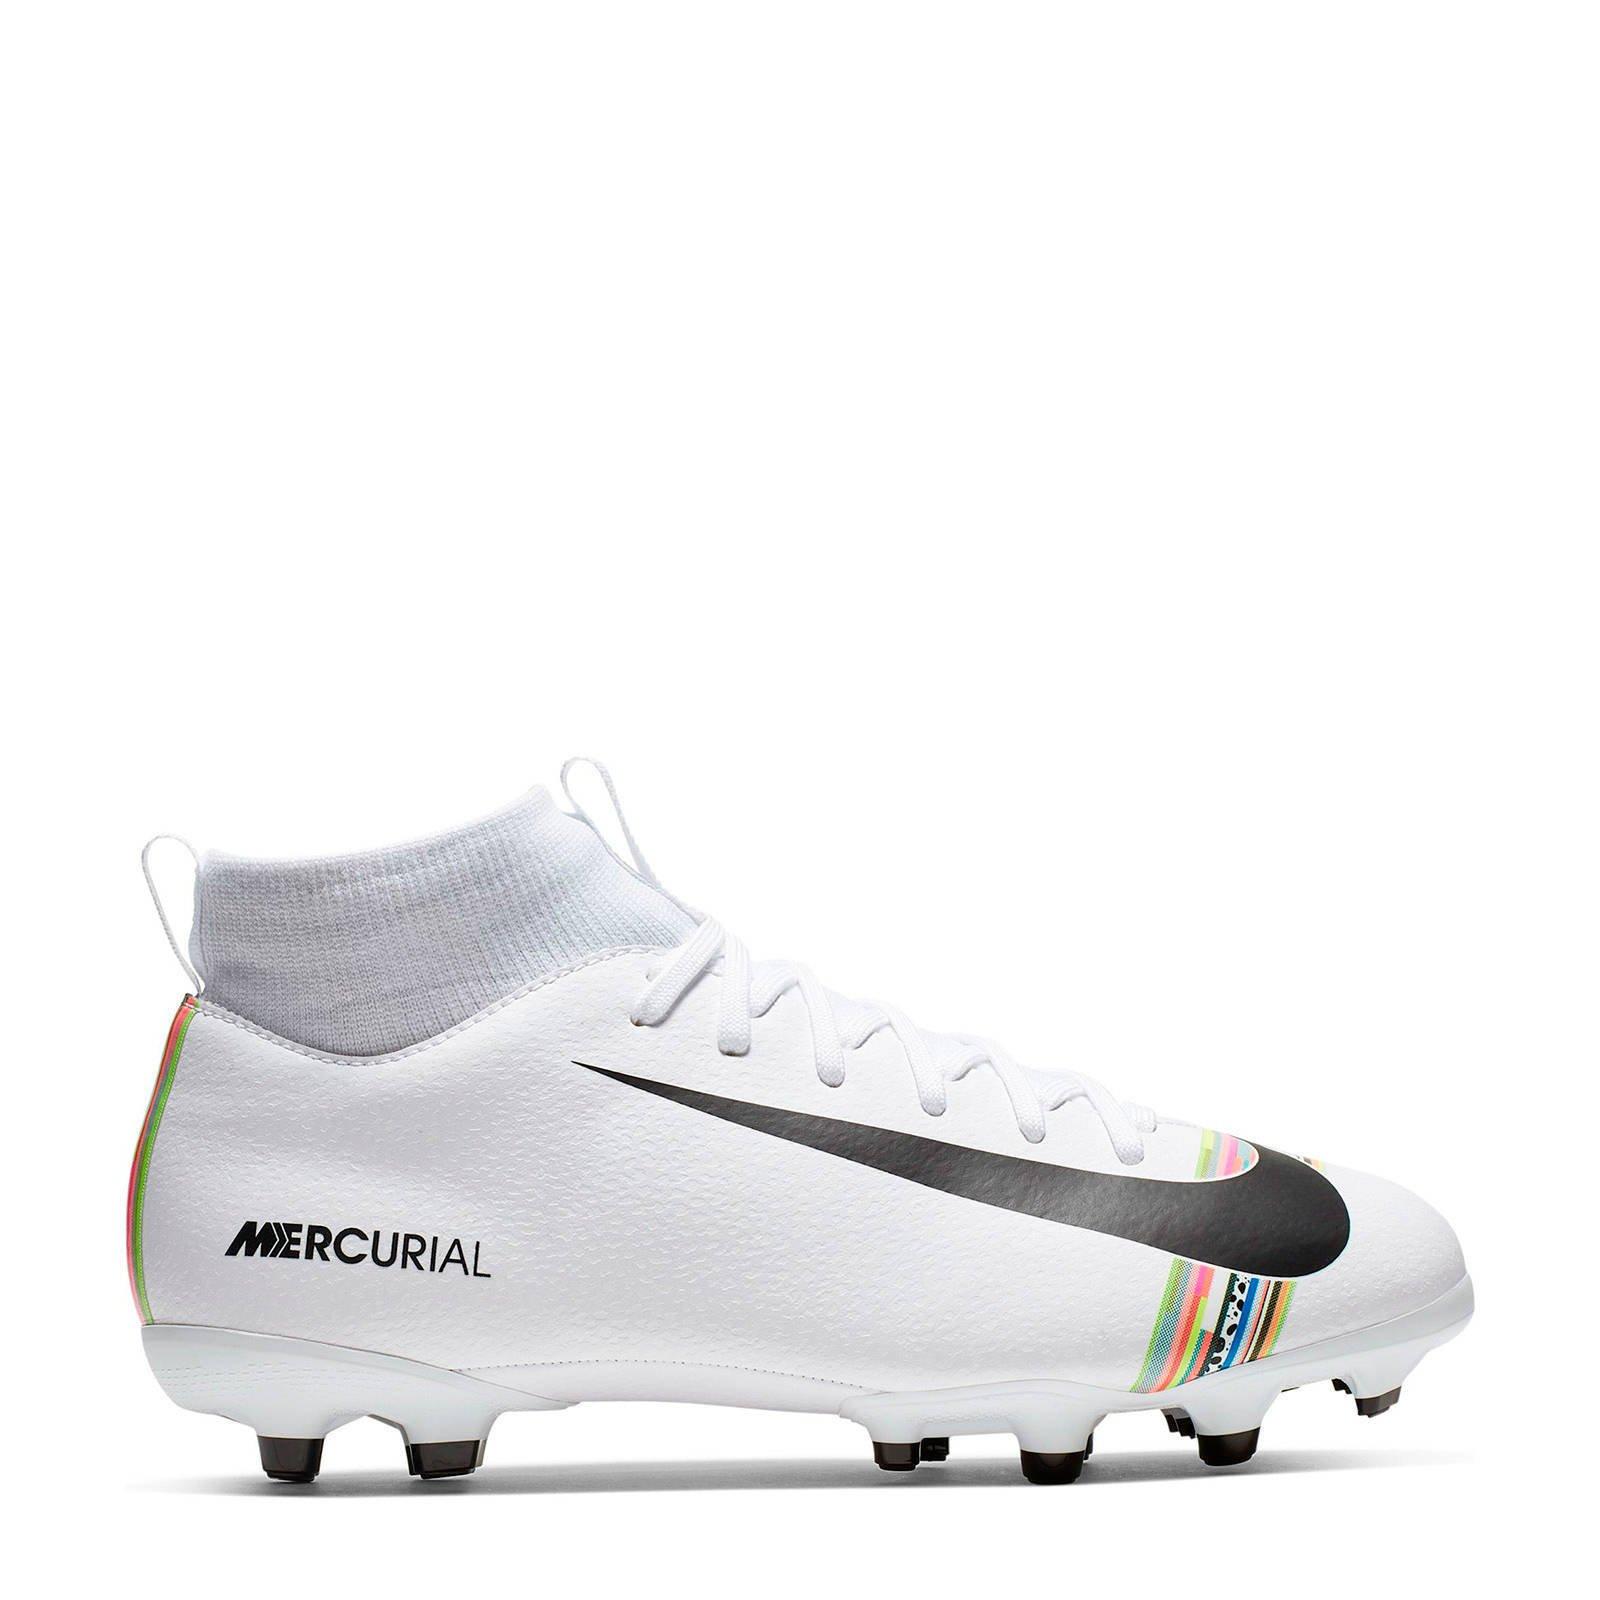 Mercurial Superfly 6 Academy GS FGMG voetbalschoenen